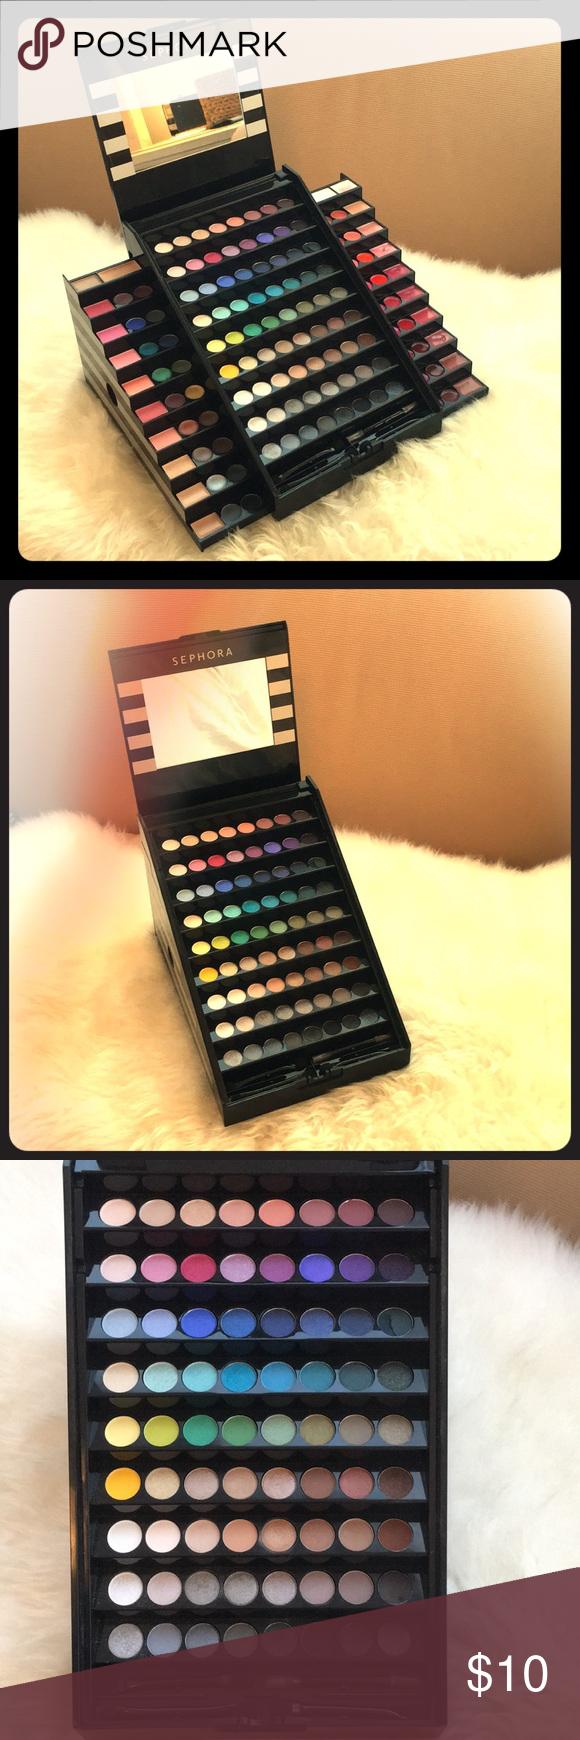 Sephora Makeup Kit Sephora makeup kit, Makeup kit